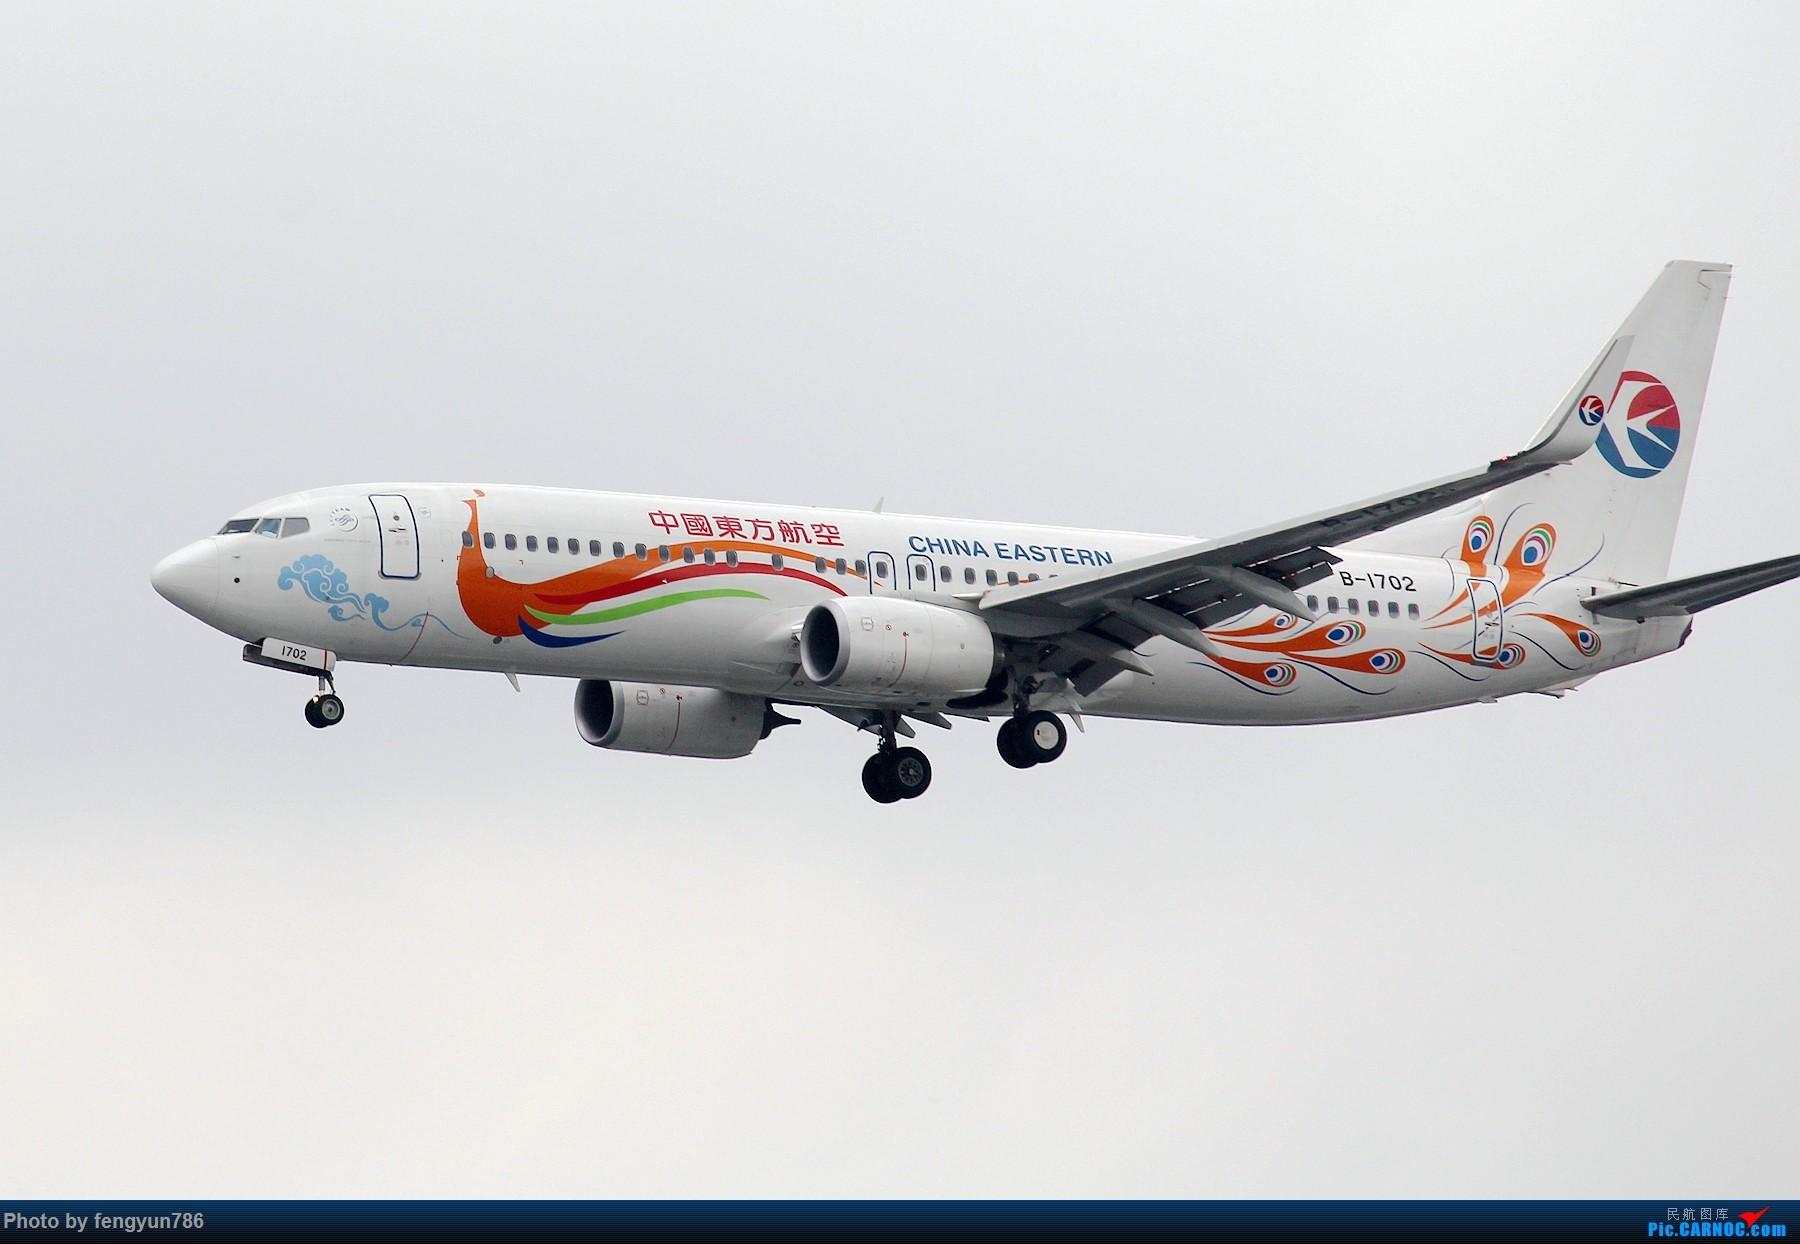 Re:[原创]新人首贴,6.18 SHA流水账 BOEING 737-800 B-1702 中国上海虹桥国际机场